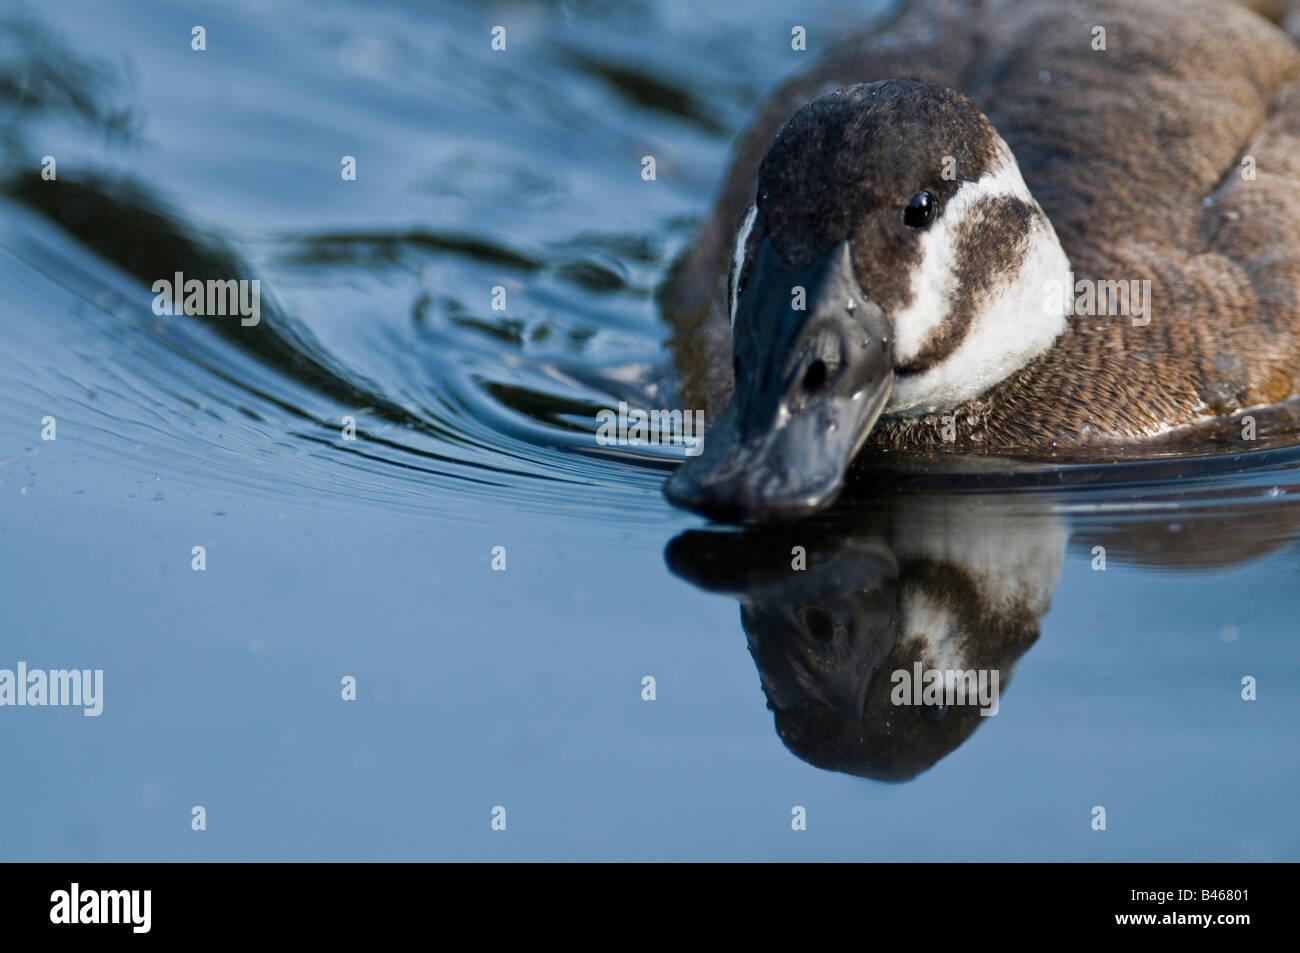 White-headed Duck  Oxyura leucocephala on water. - Stock Image